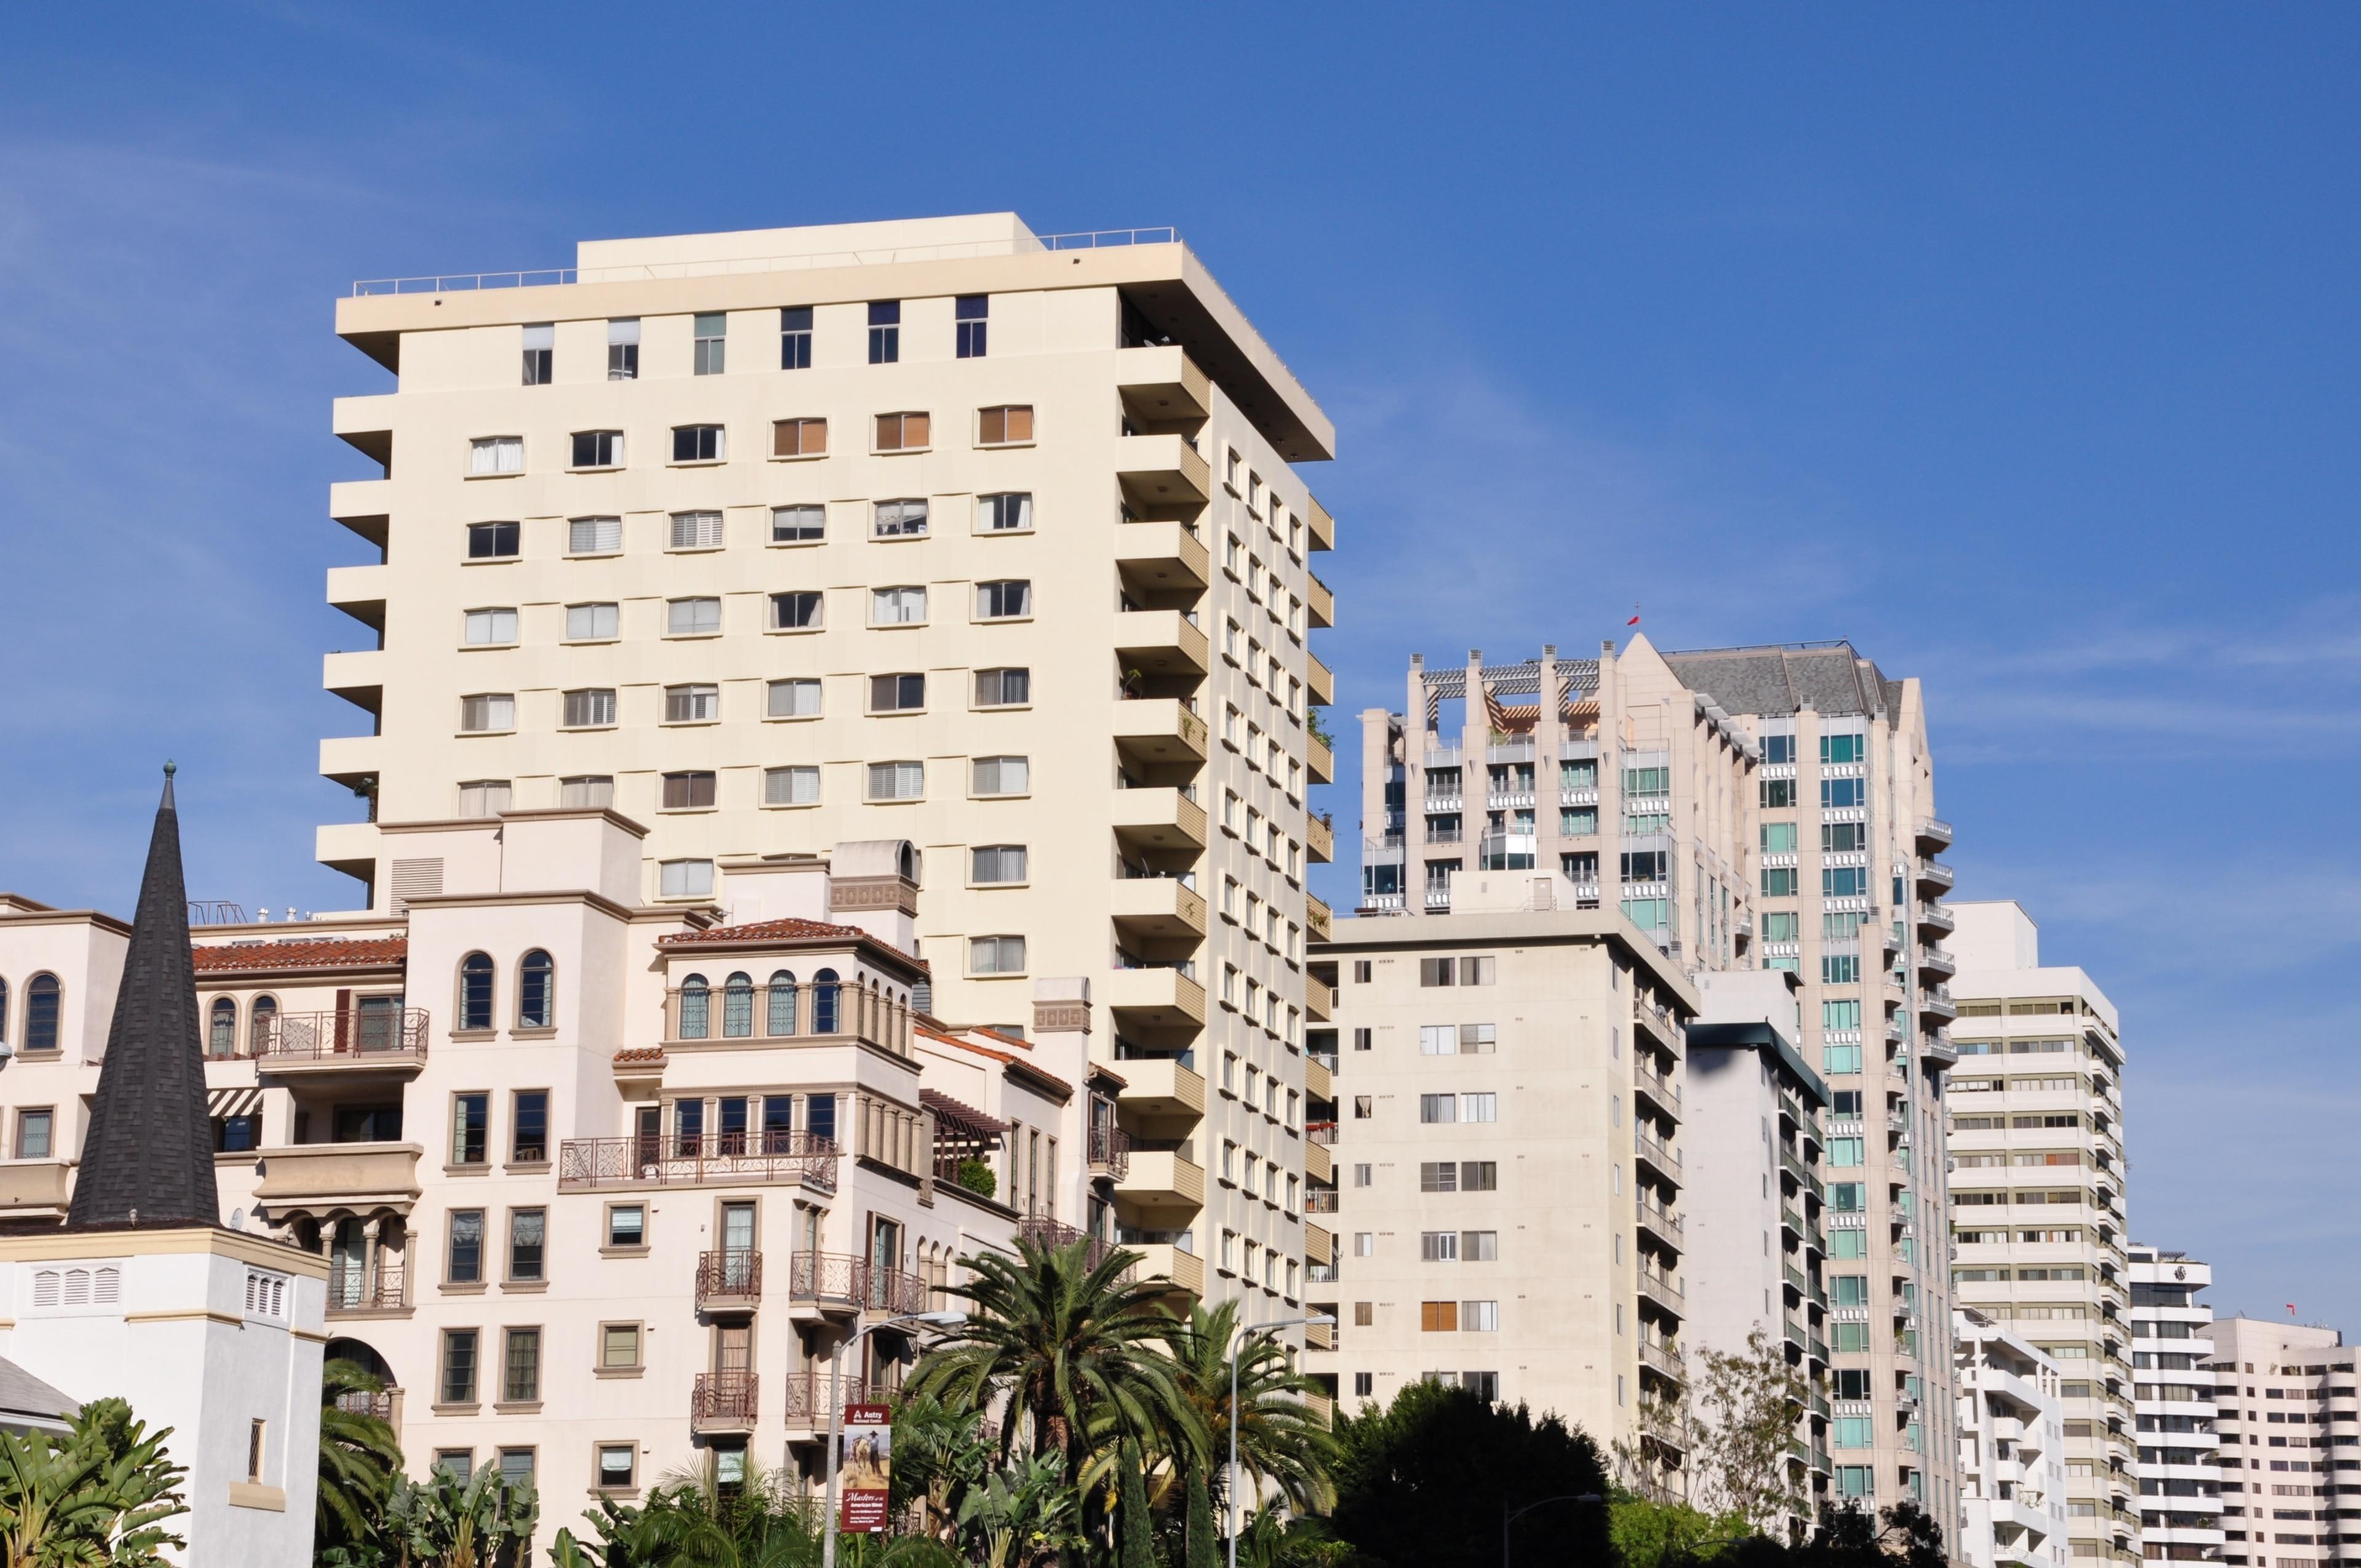 Westwood, Los Angeles, California, United States of America